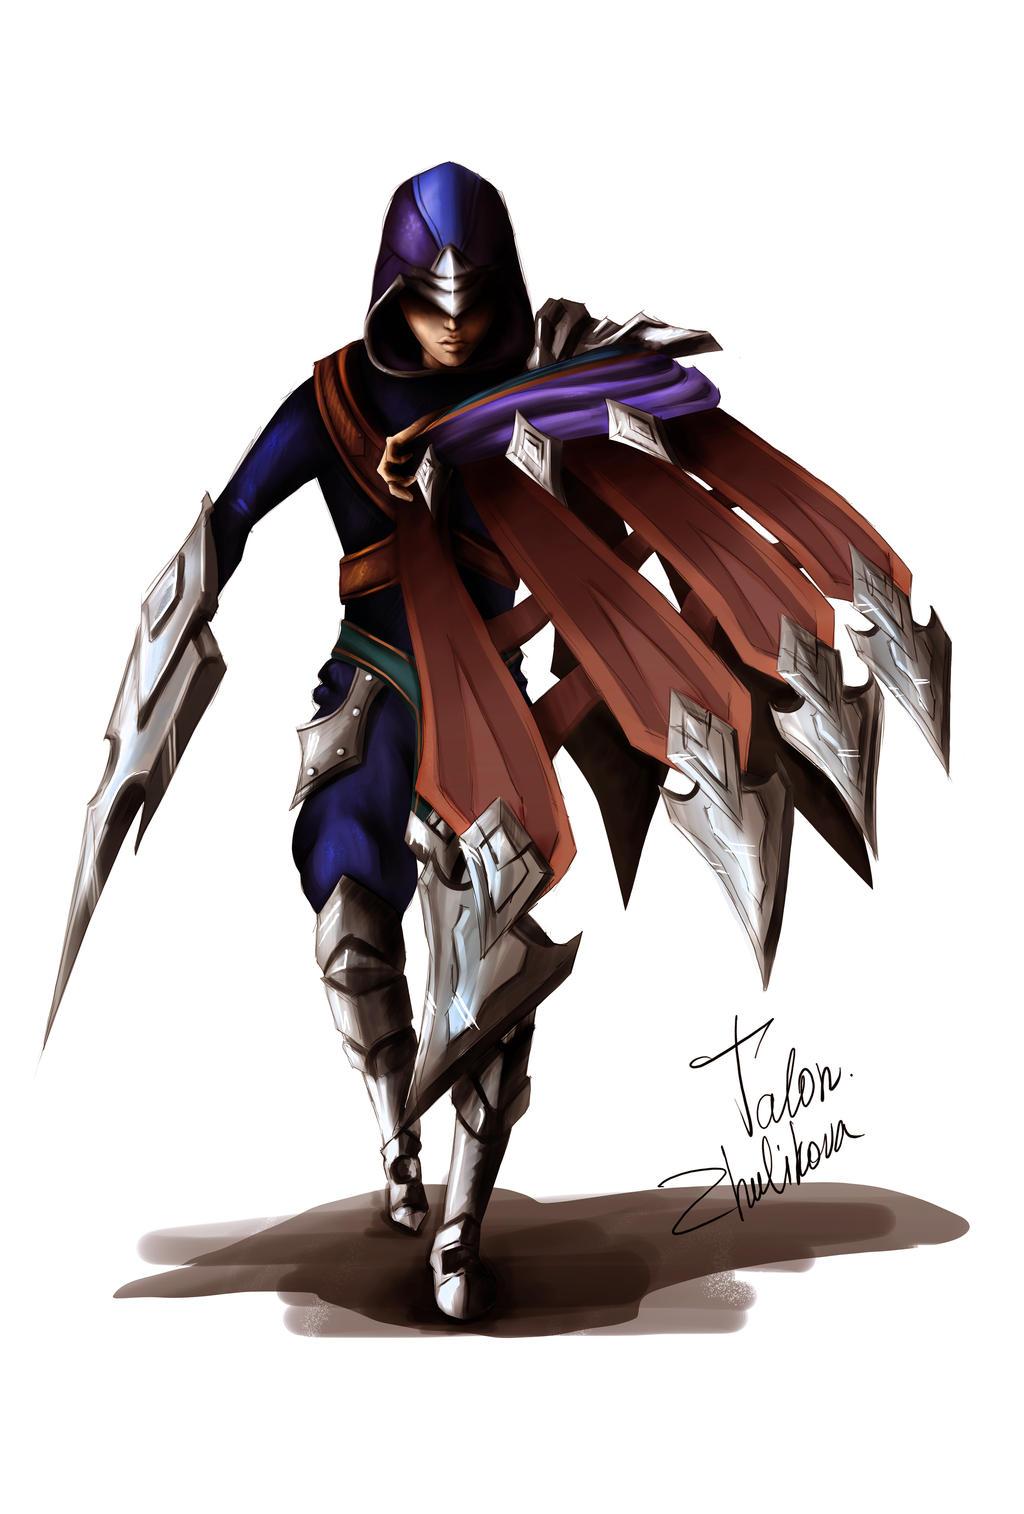 Talon By Zhulikova On Deviantart